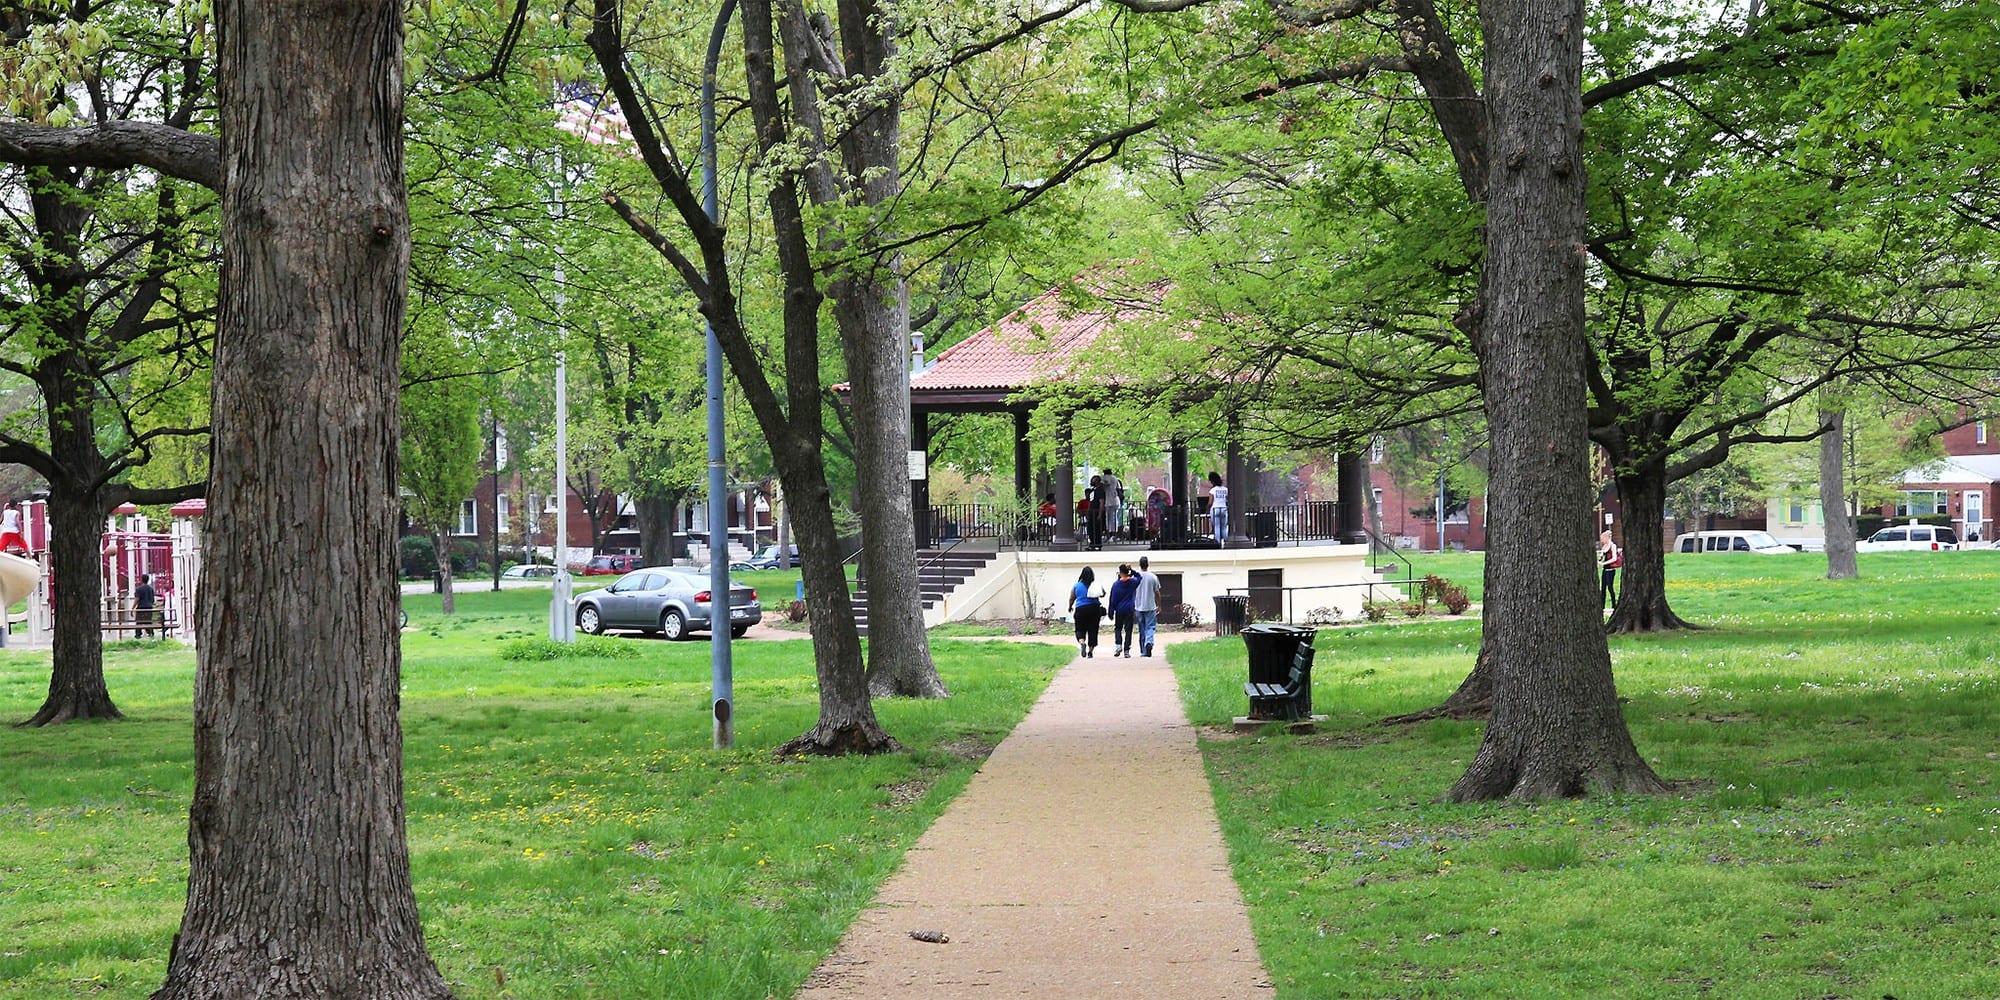 People gathering at the Gravois Park pavilion. Photo by Paul Sableman.